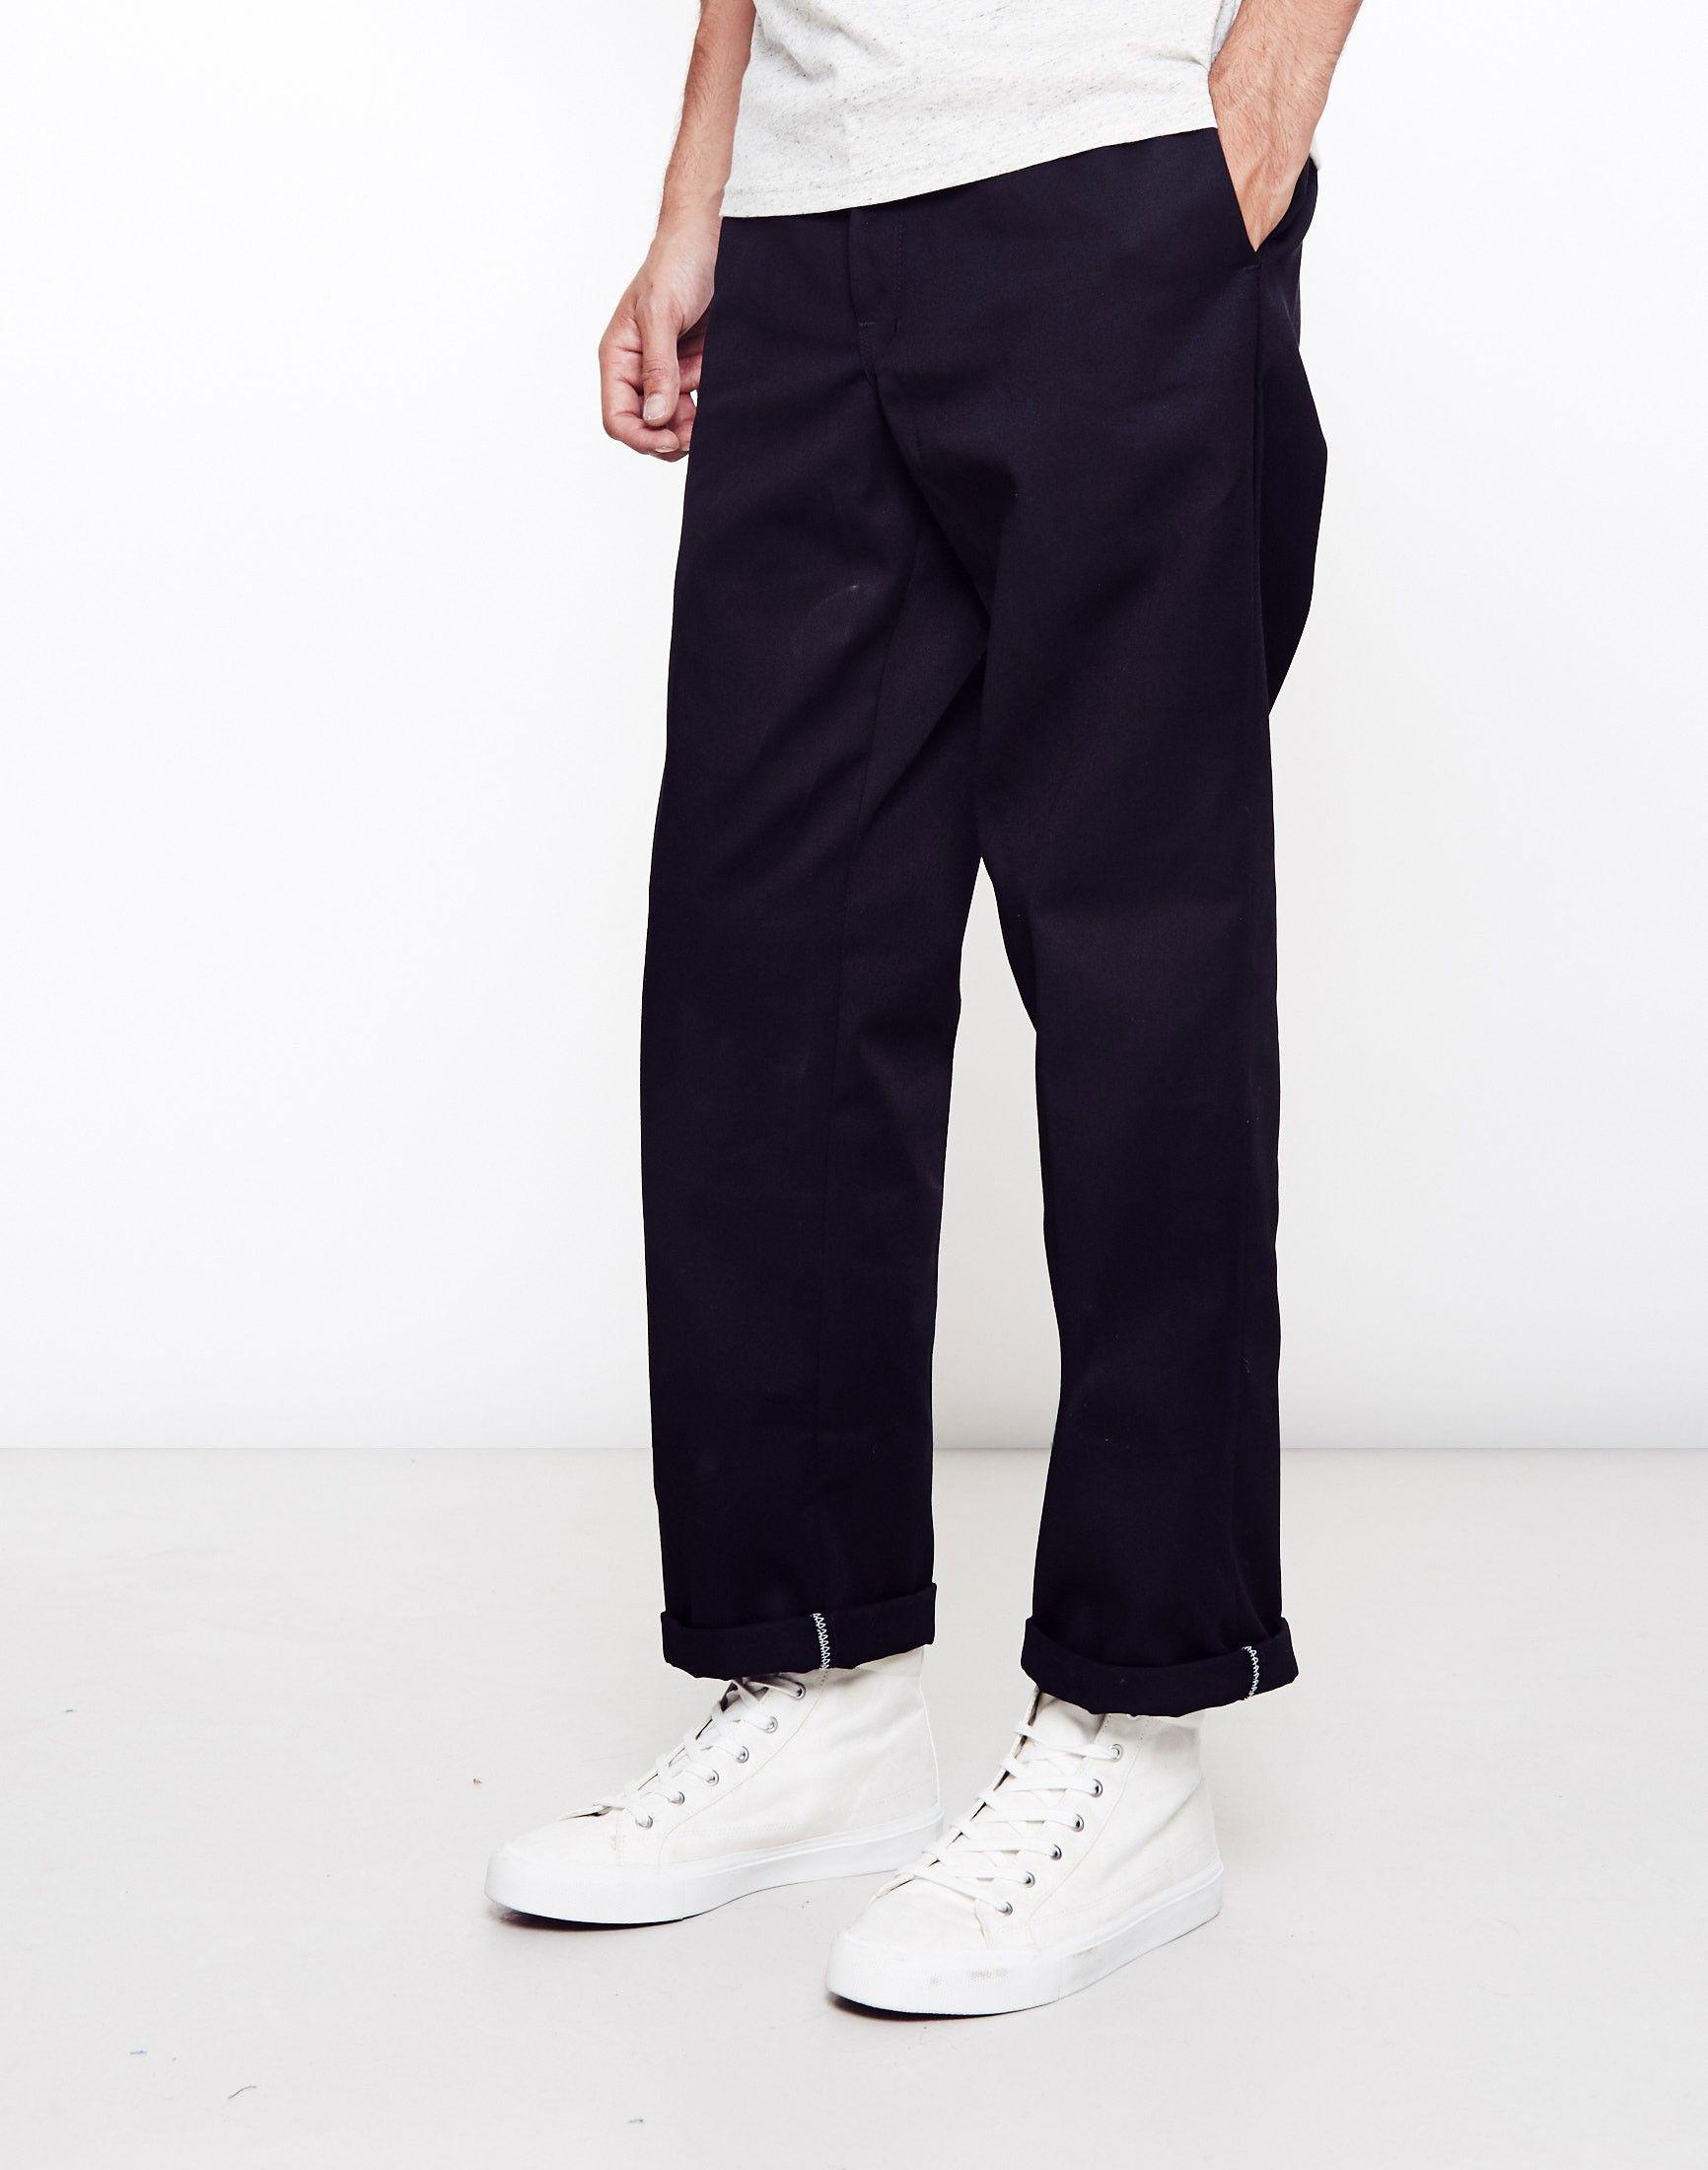 NEW Dickies Mens Original Classic 874 Plain Flat Front Work Pants Light Blue